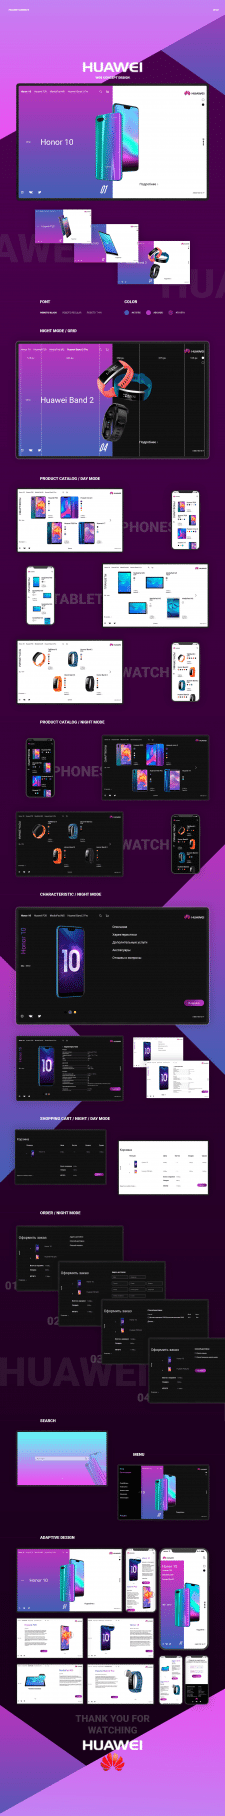 Huawei web concept design